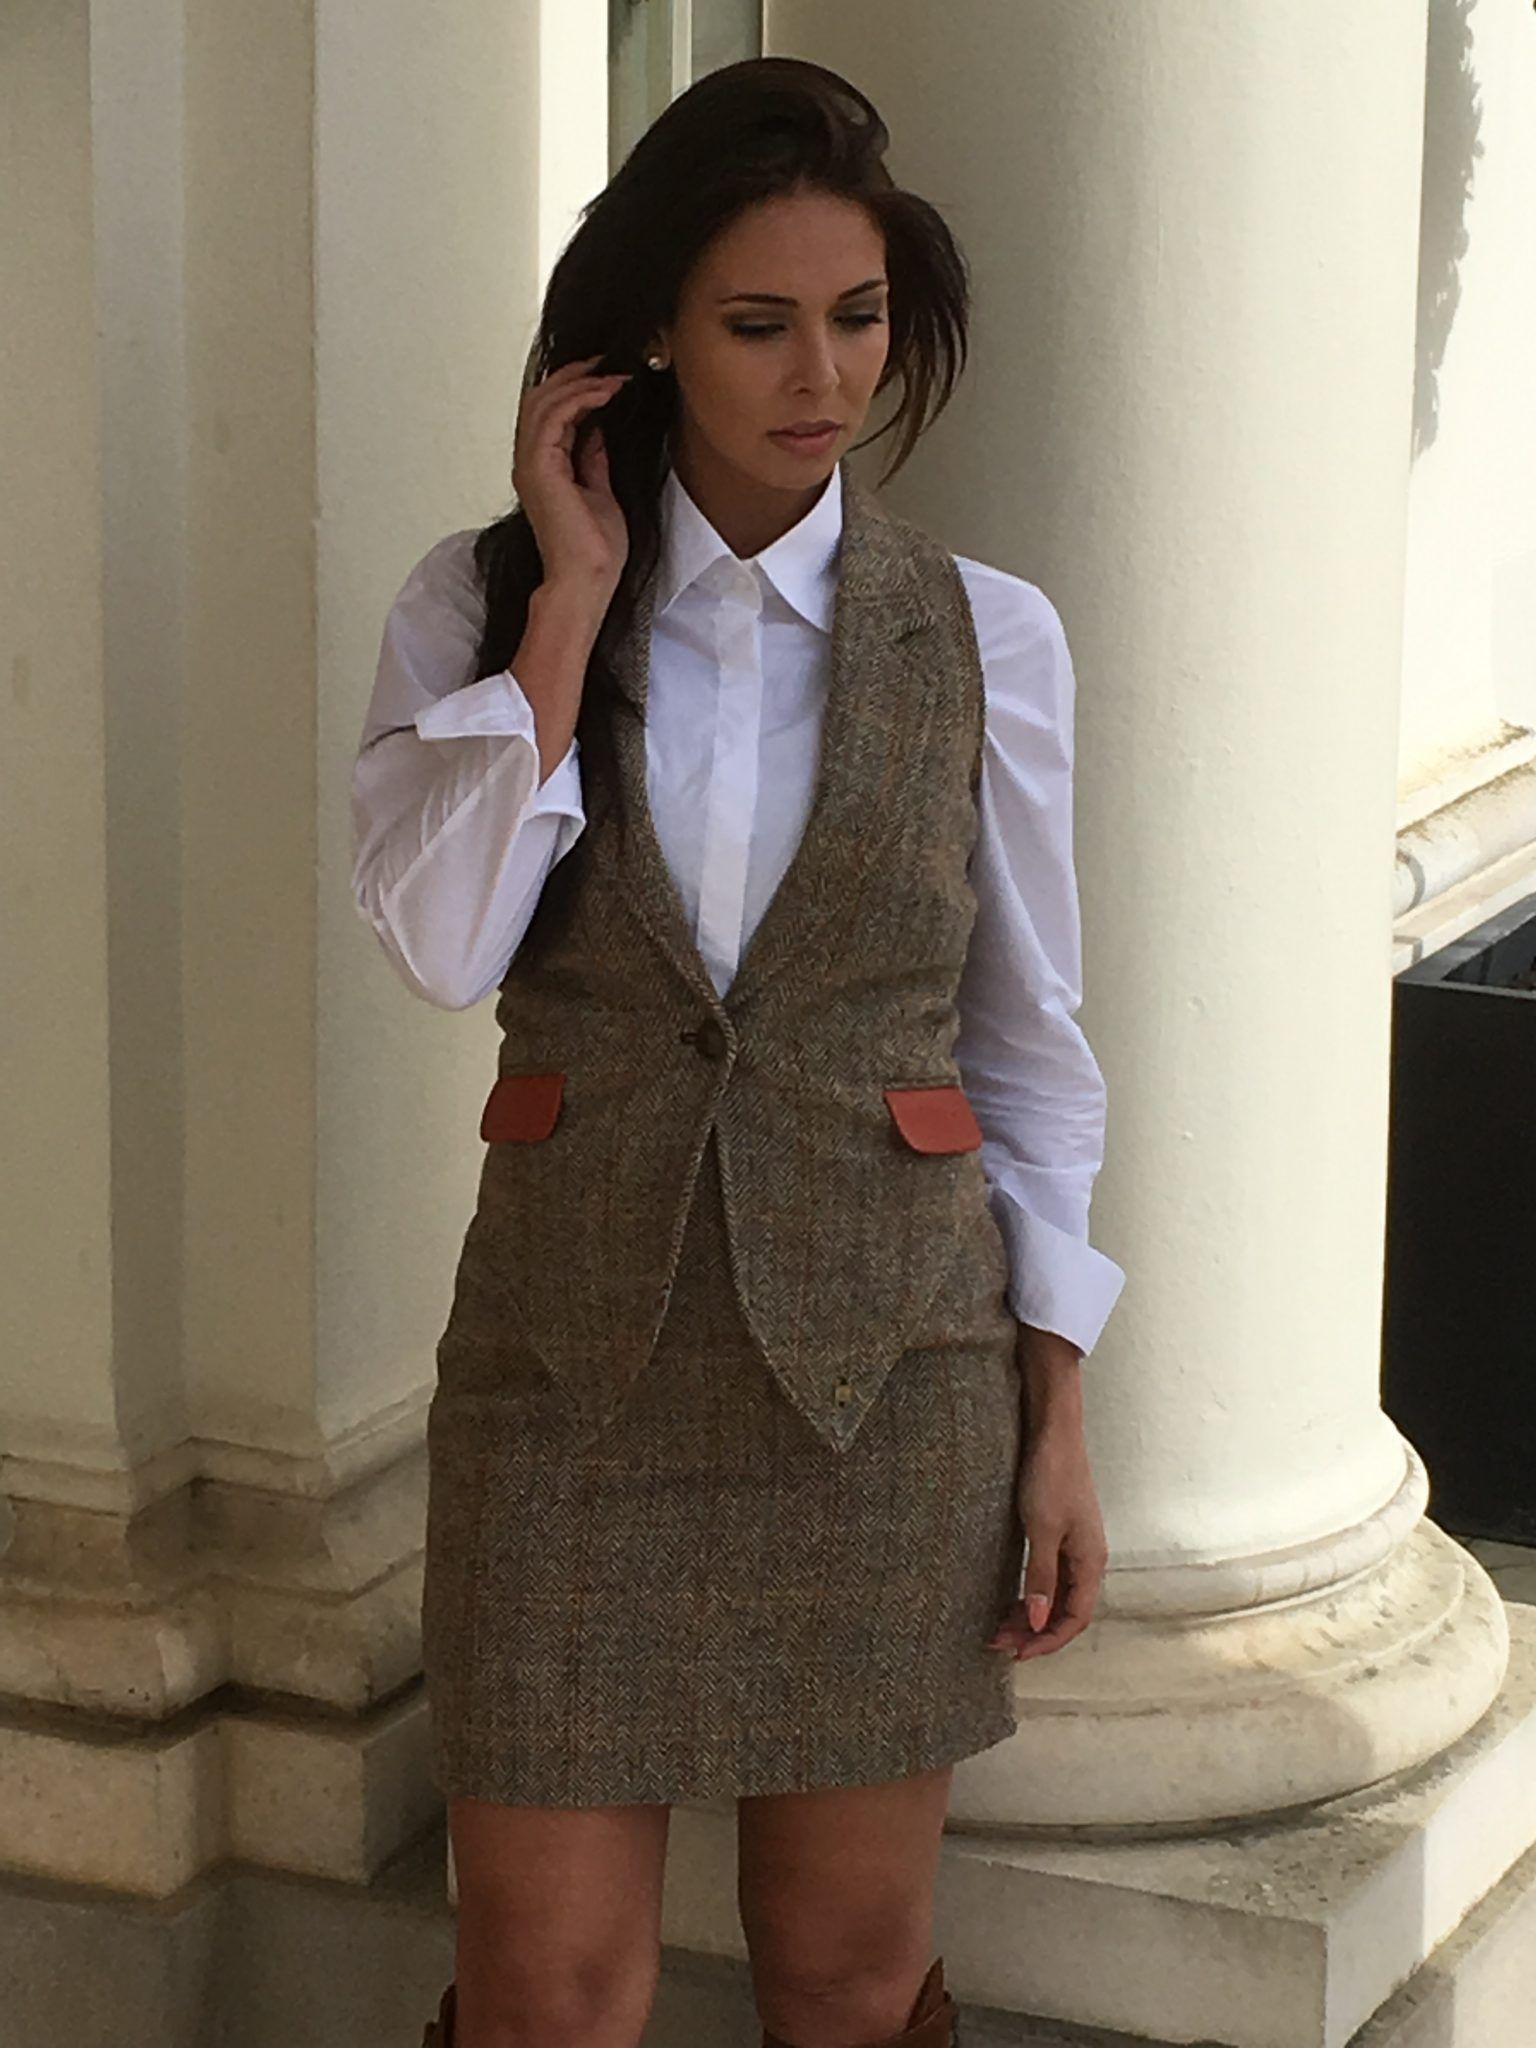 47198b72d27d Image result for harris tweed suit women | Nostalgia